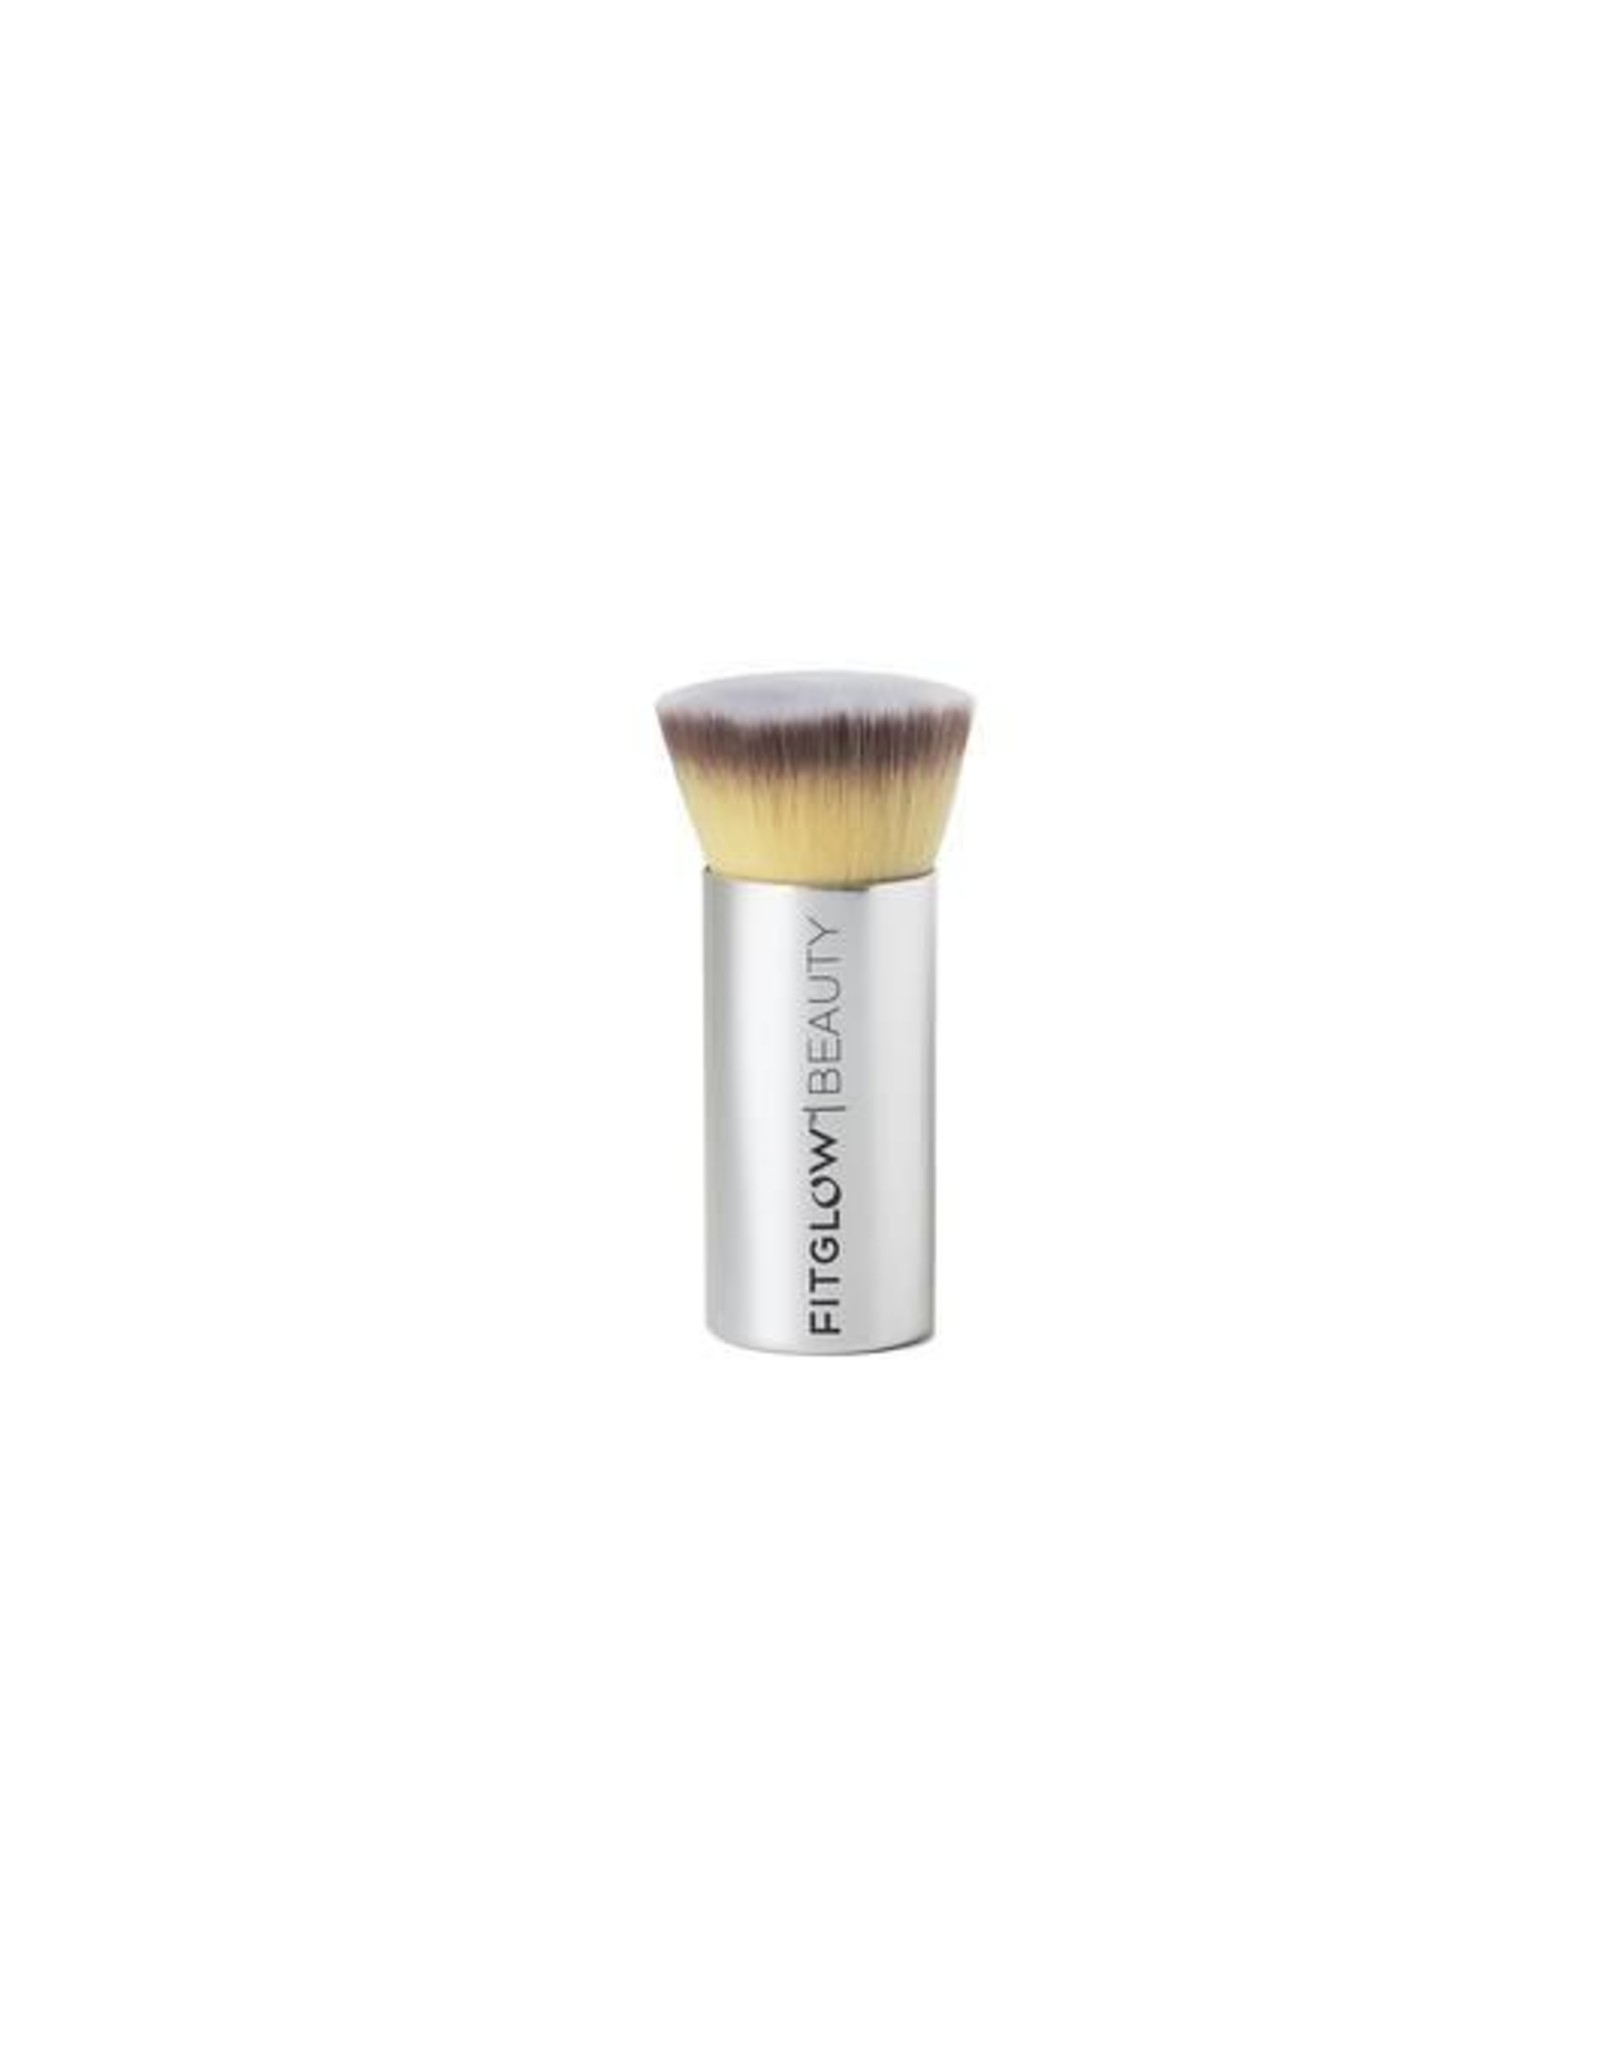 Fitglow Beauty Vegan Teddy Foundation Brush